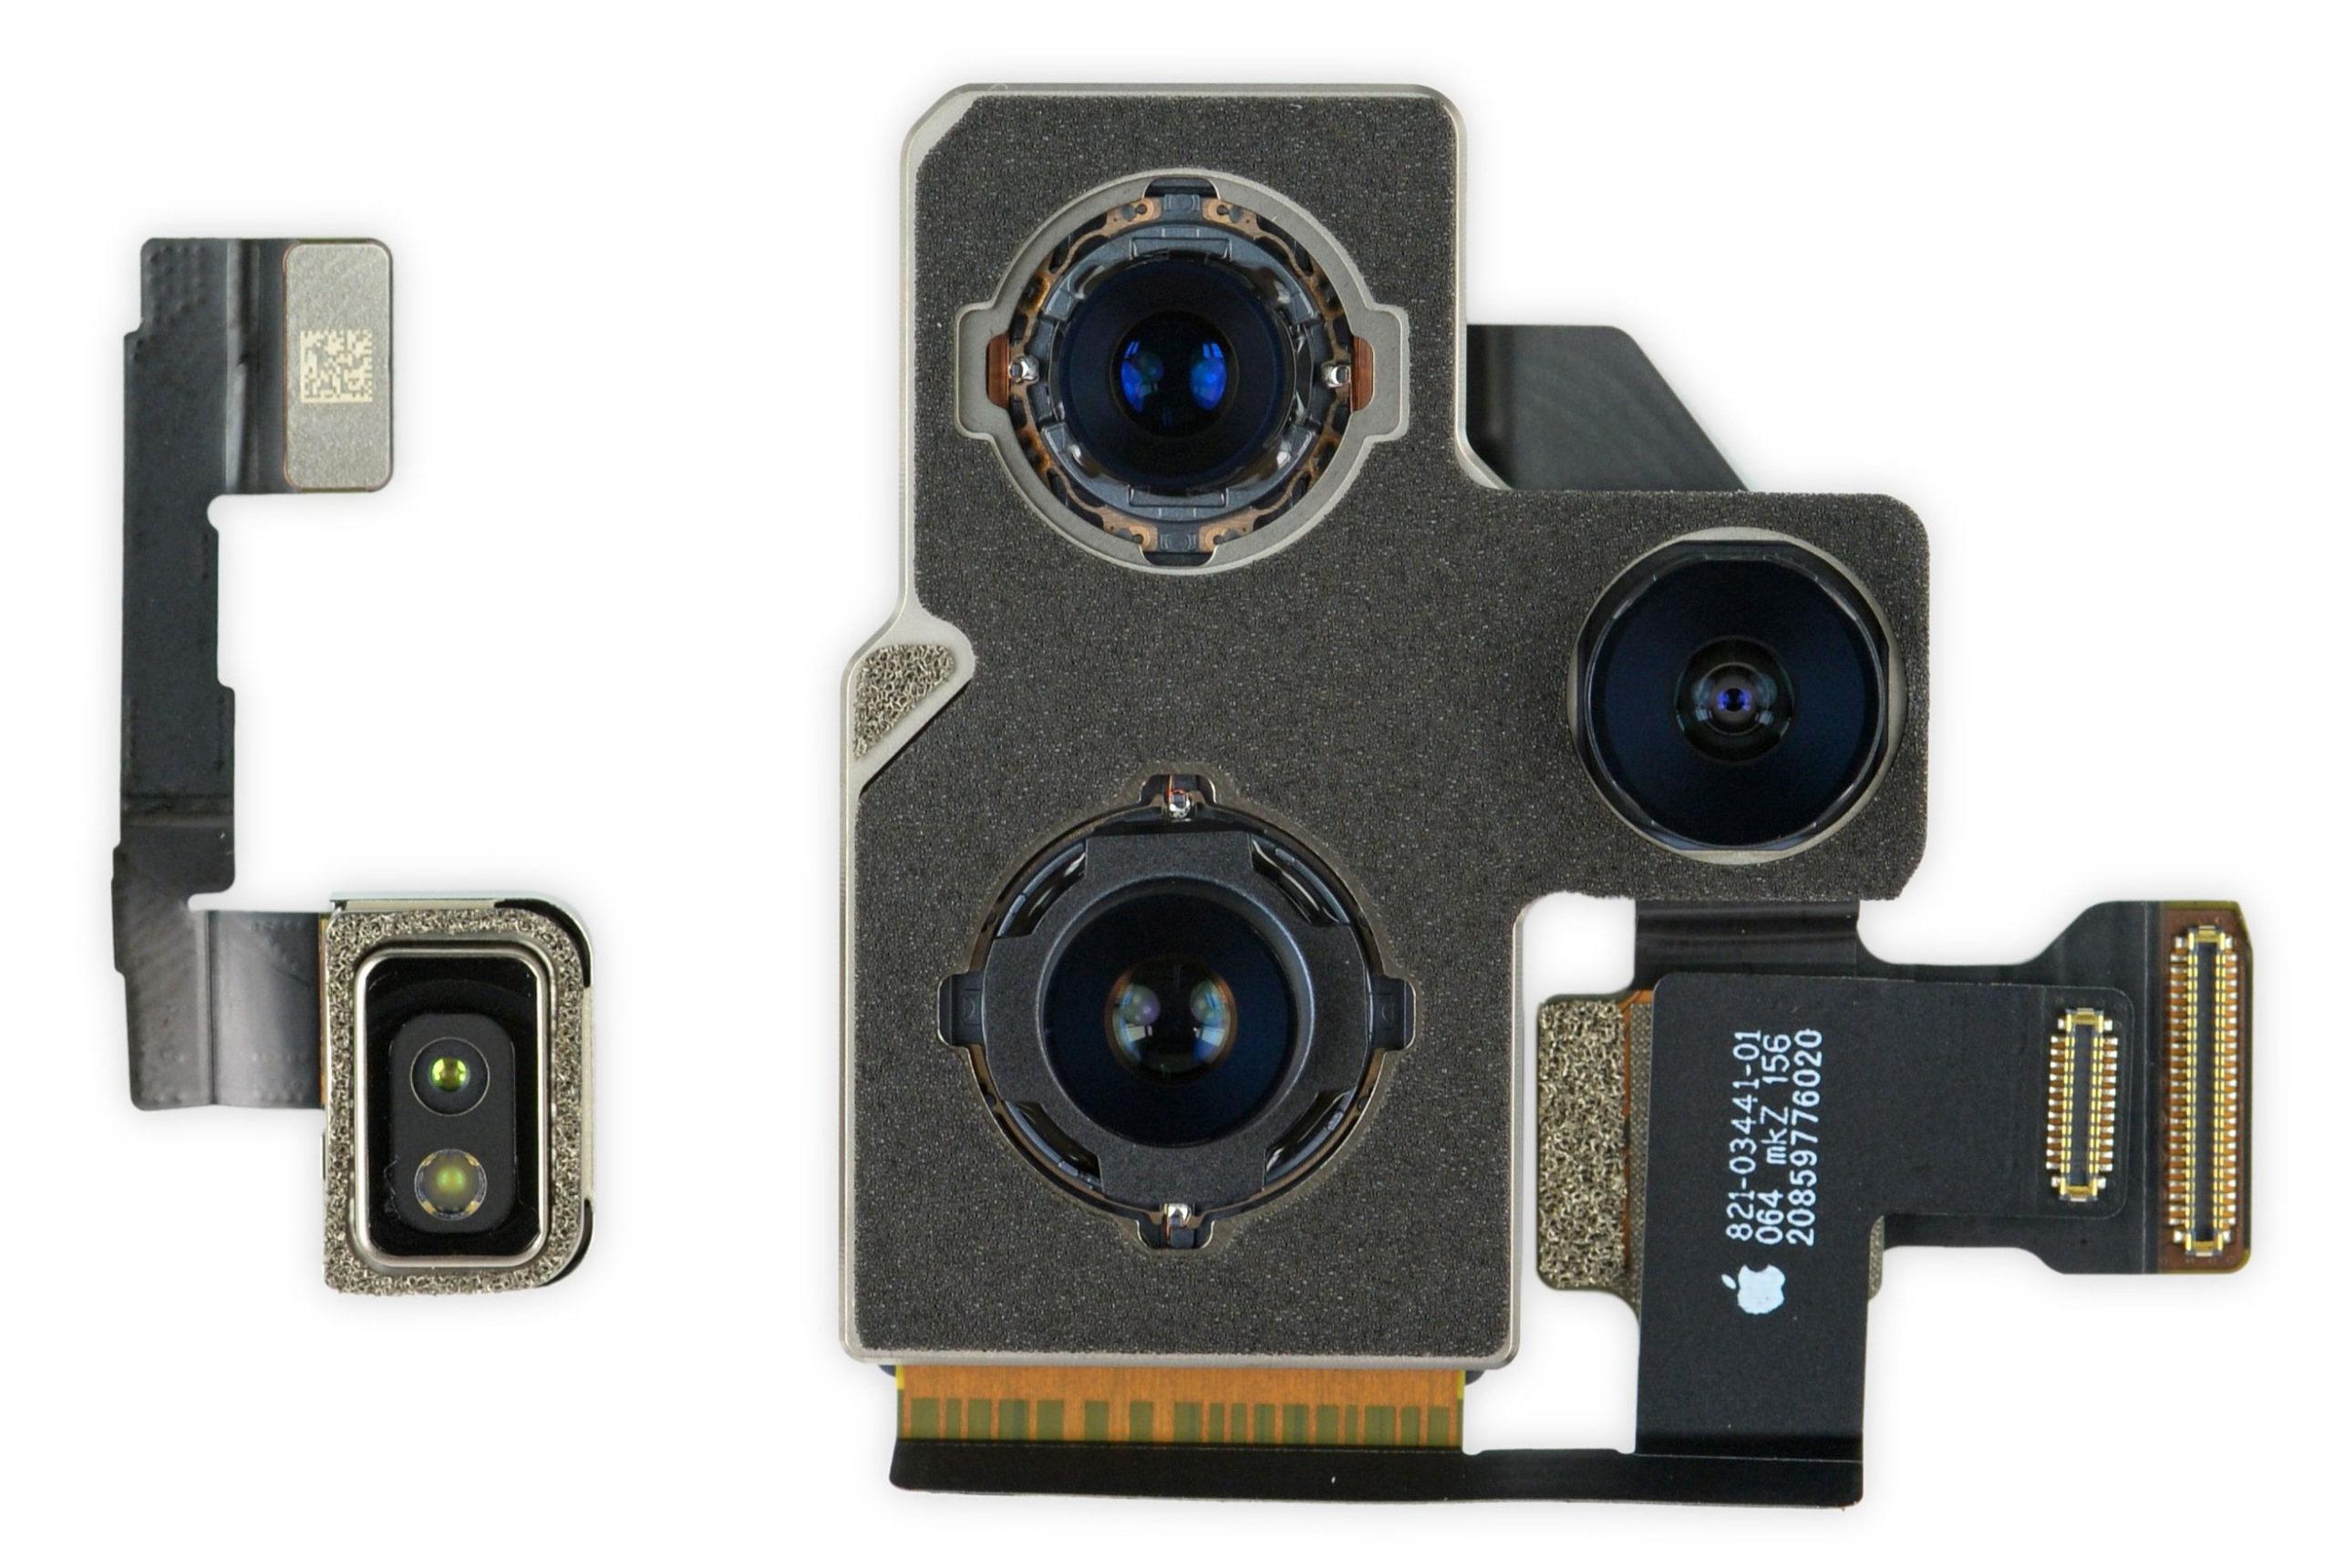 Módulos de cámara del iPhone 12 Pro Max